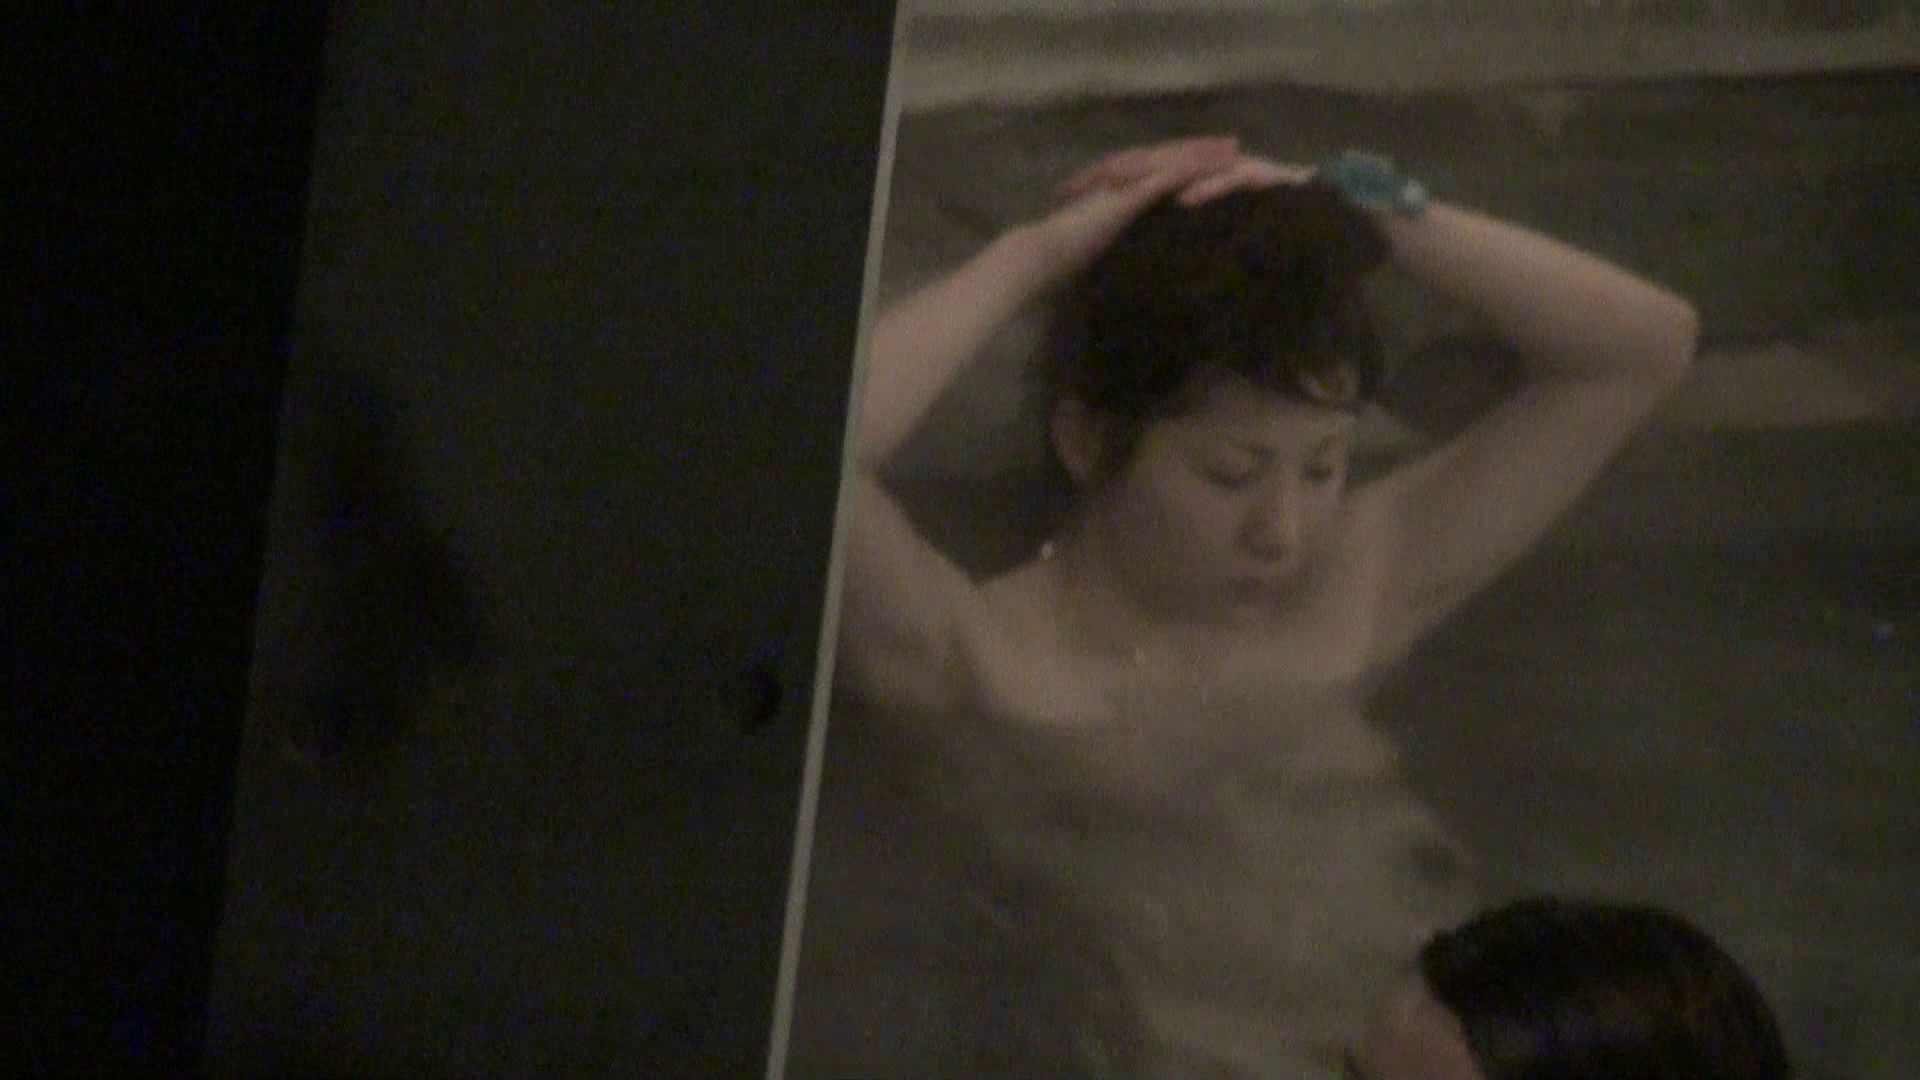 Aquaな露天風呂Vol.440 OLセックス 盗撮おまんこ無修正動画無料 63画像 47